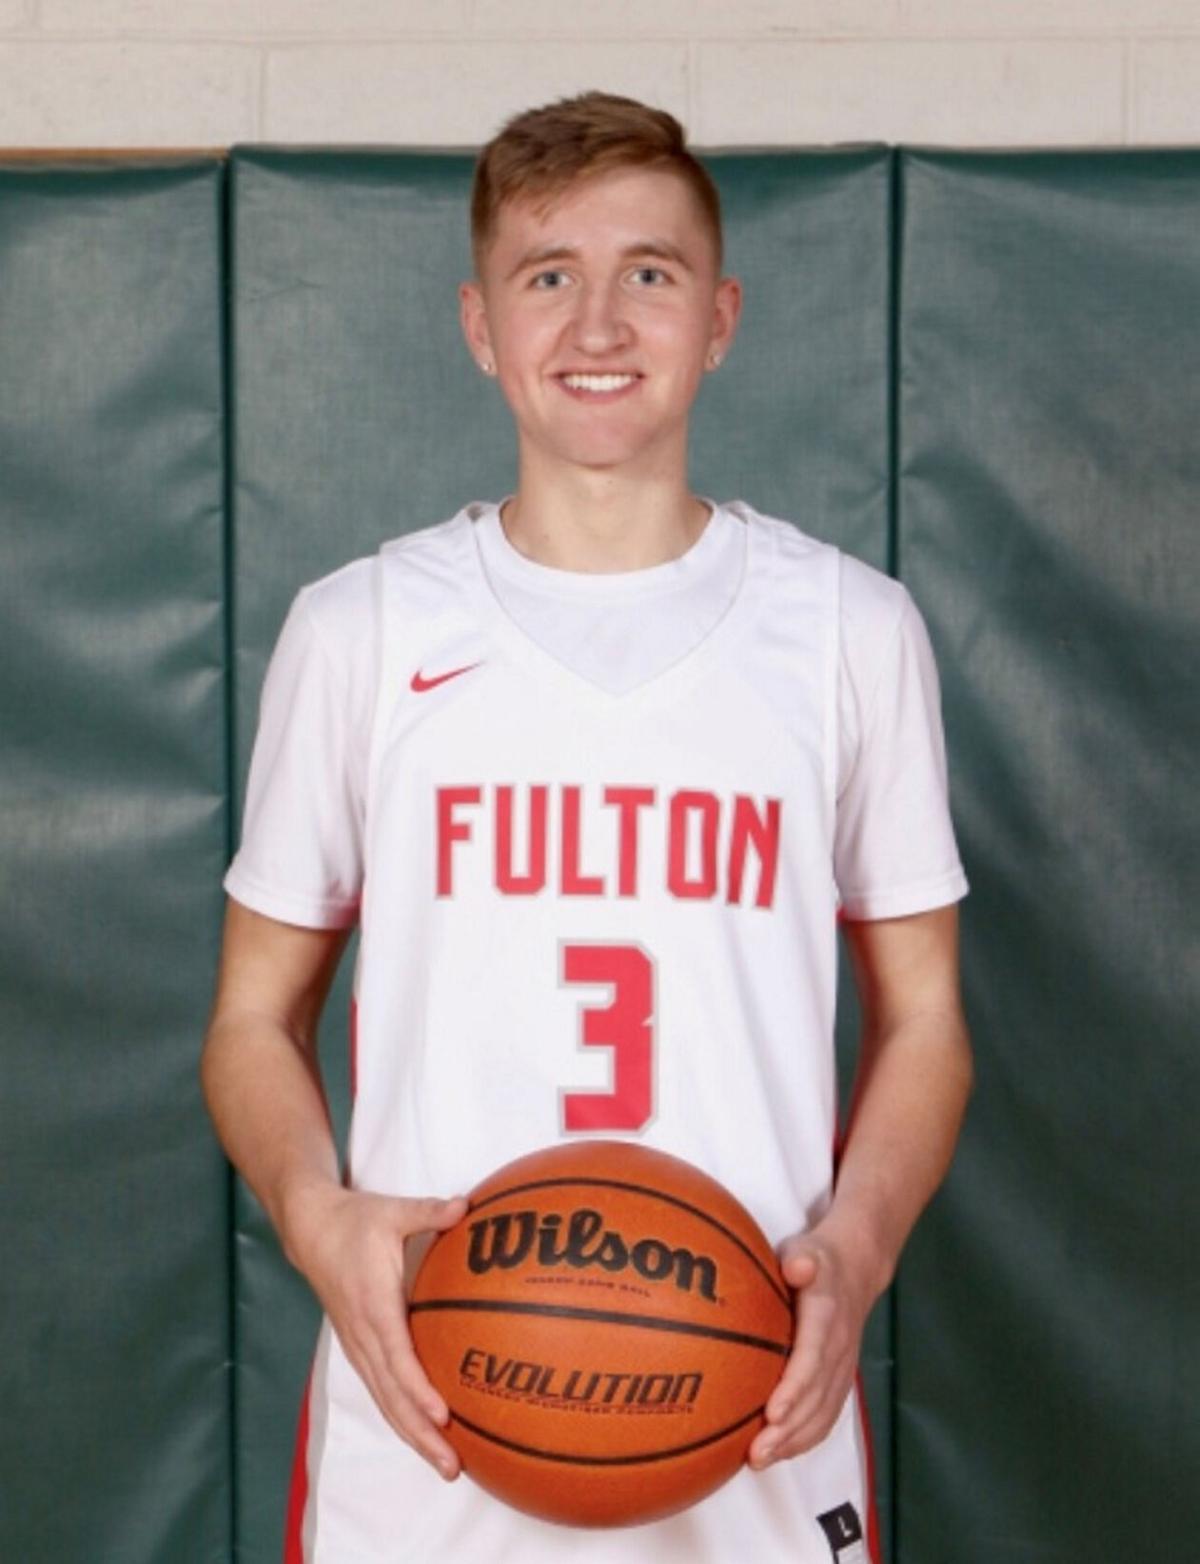 Fulton's Seth Grimshaw pursues basketball dreams